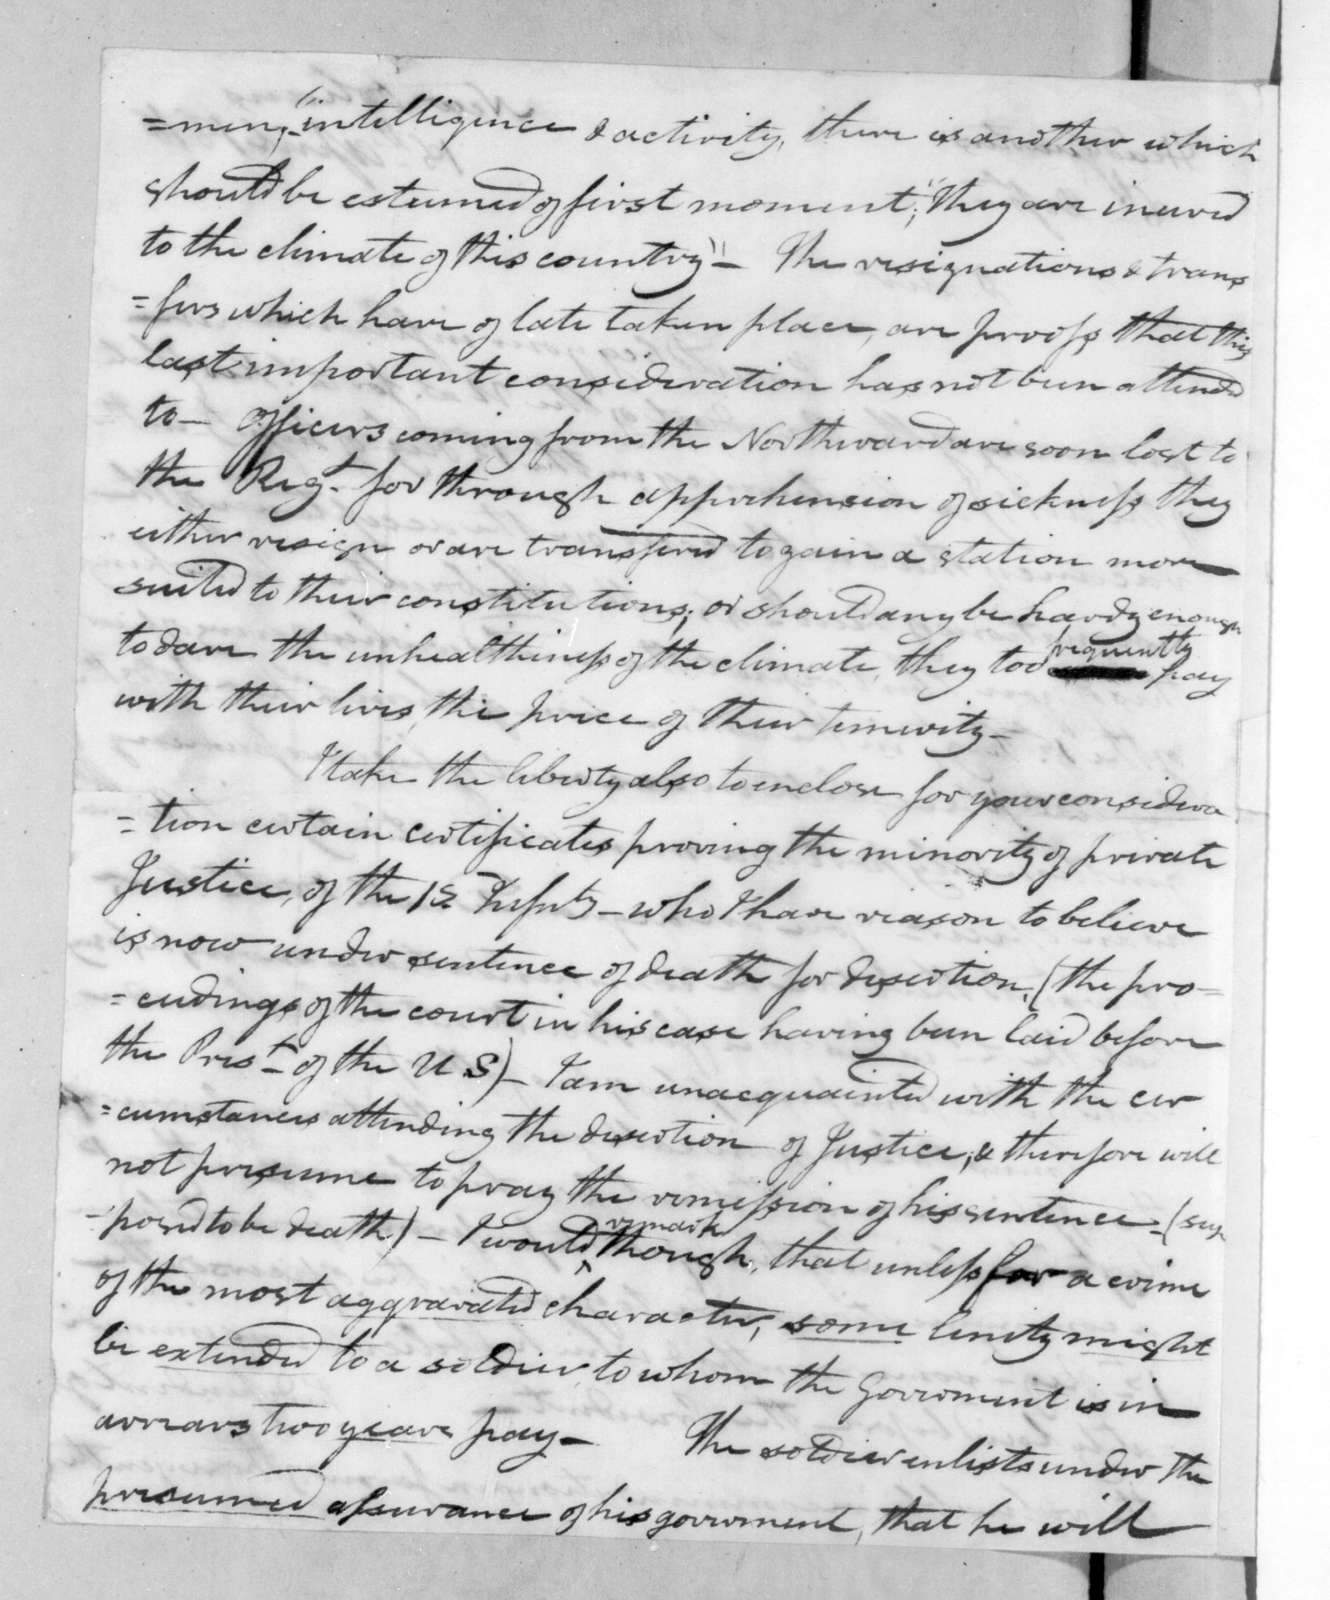 George Croghan to Andrew Jackson, April 18, 1816